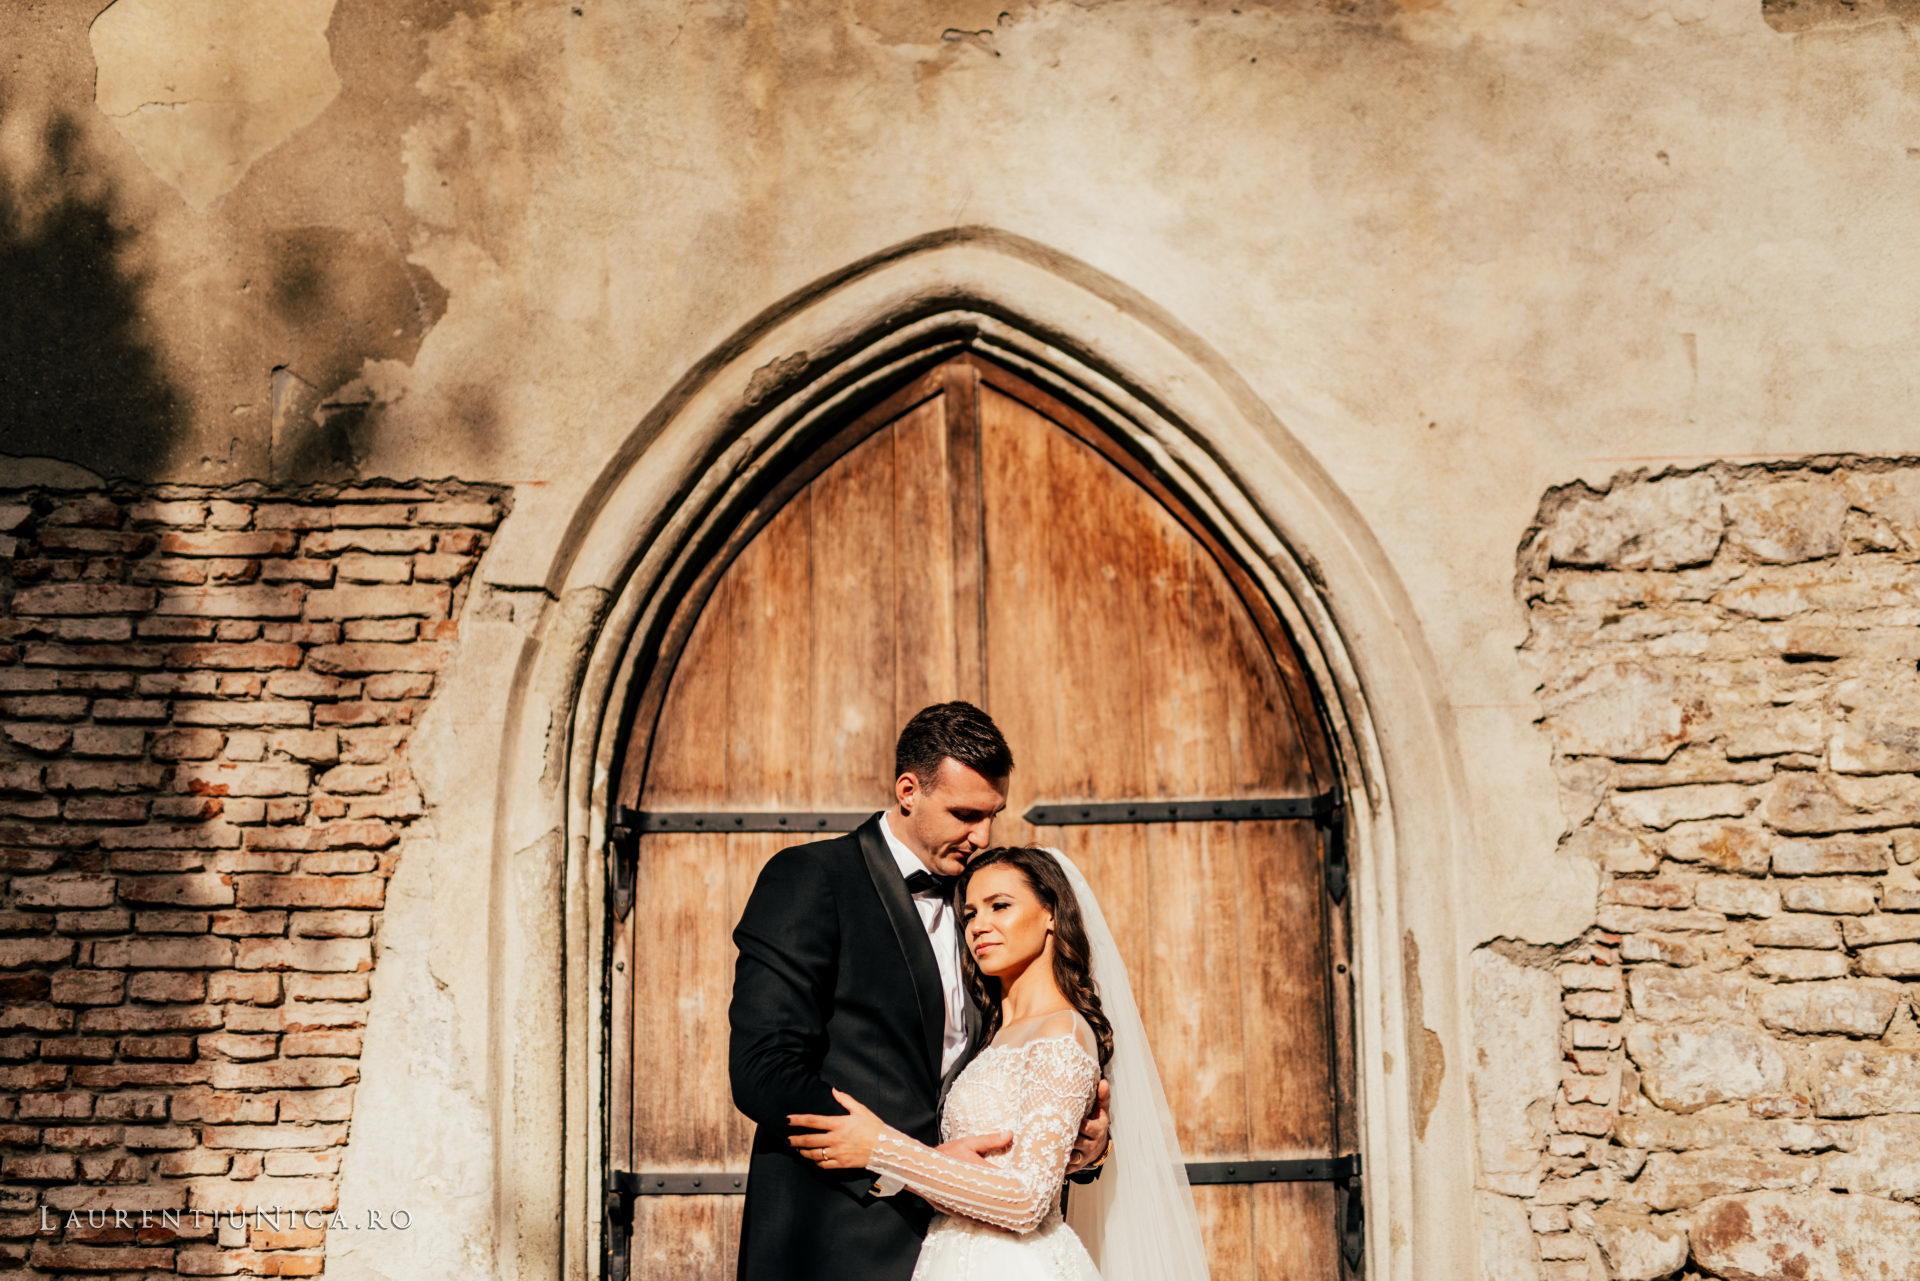 lili-si-dan-fotografii-nunta-after-wedding-sighisoara-laurentiu-nica03